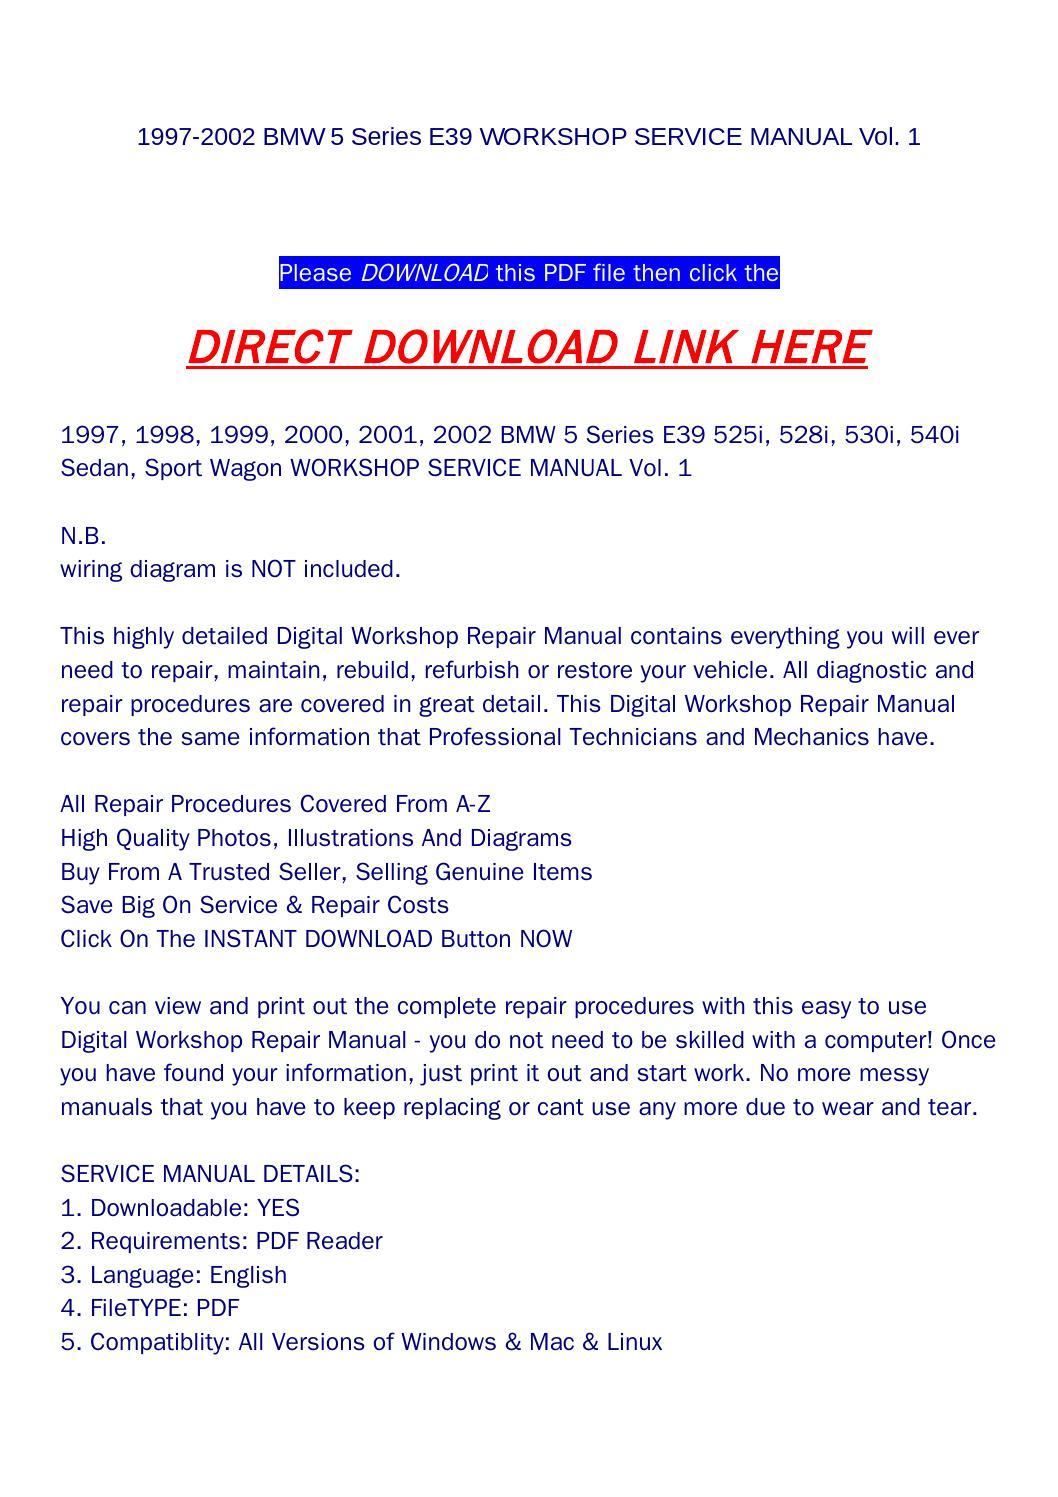 1997 2002 Bmw 5 Series E39 Workshop Service Manual Vol 1 By Goodmanami